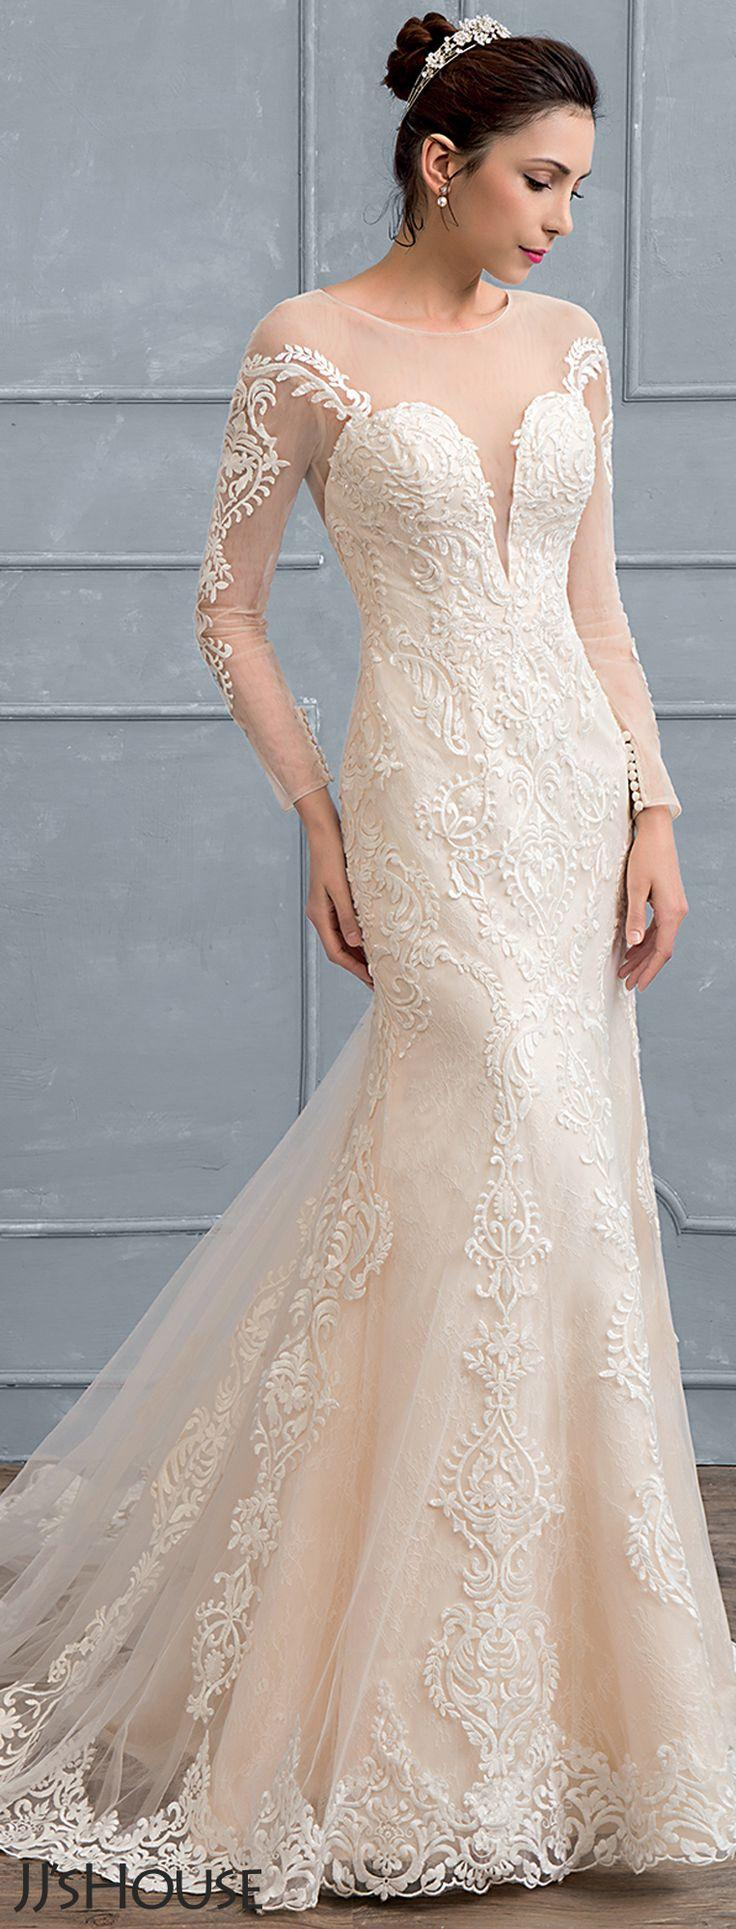 Dress Jjshouse Wedding Dresses 2736271 Weddbook